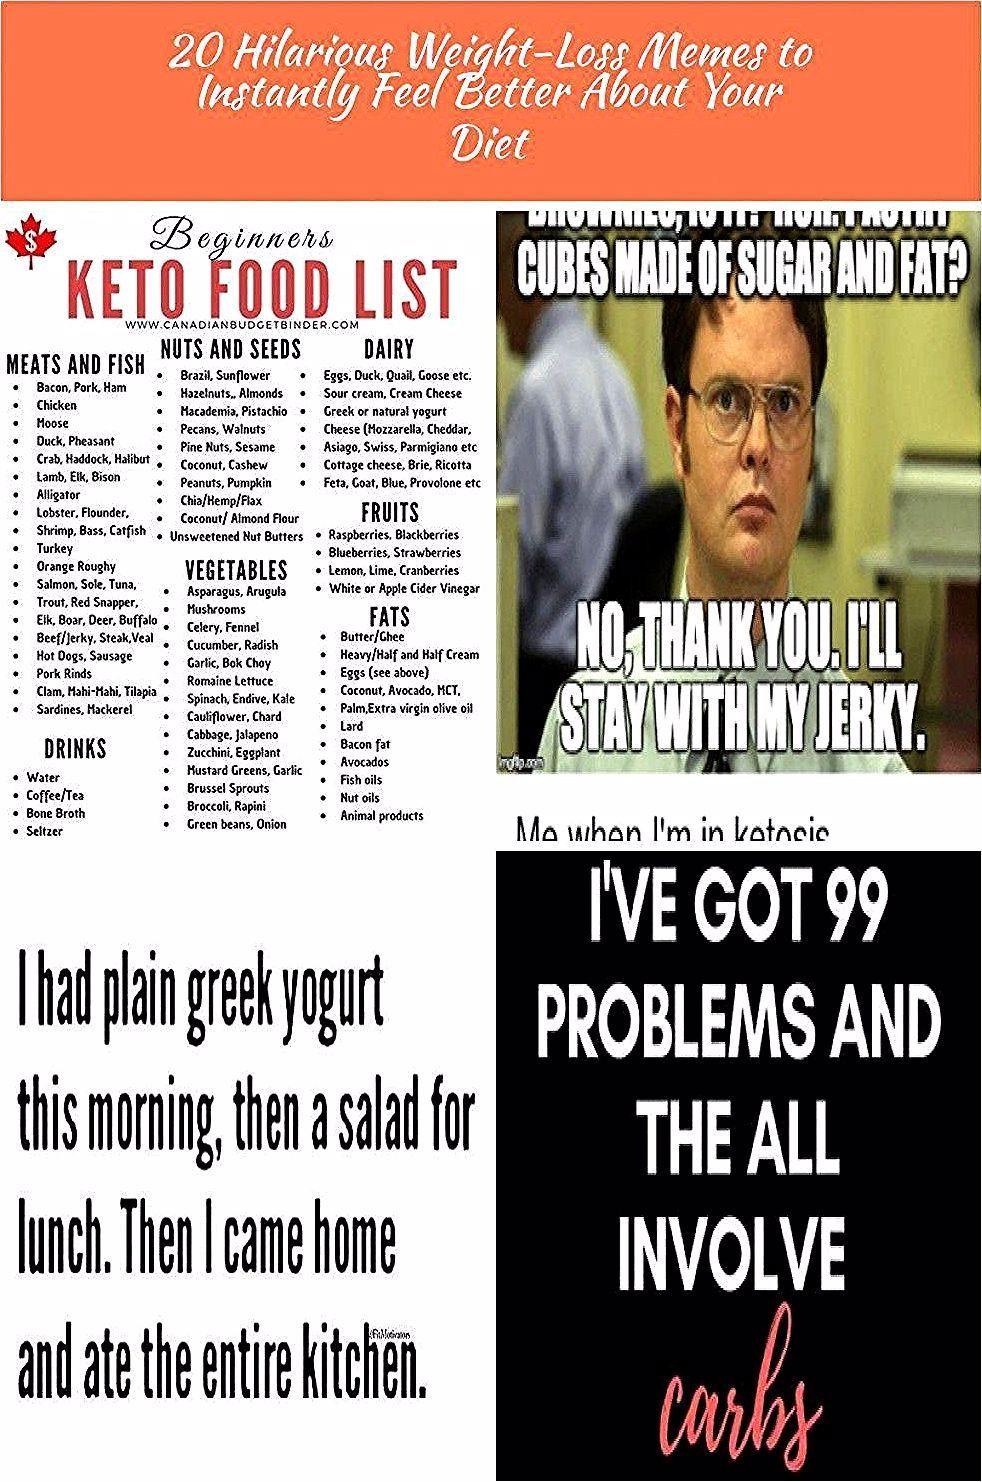 Shararat Jiya Dieting Dieting Using Frozen Meals Friends Dieting Memes Yo Shararat Jiya Dieting Dieting Us In 2020 Diet Meme Diet Frozen Meals